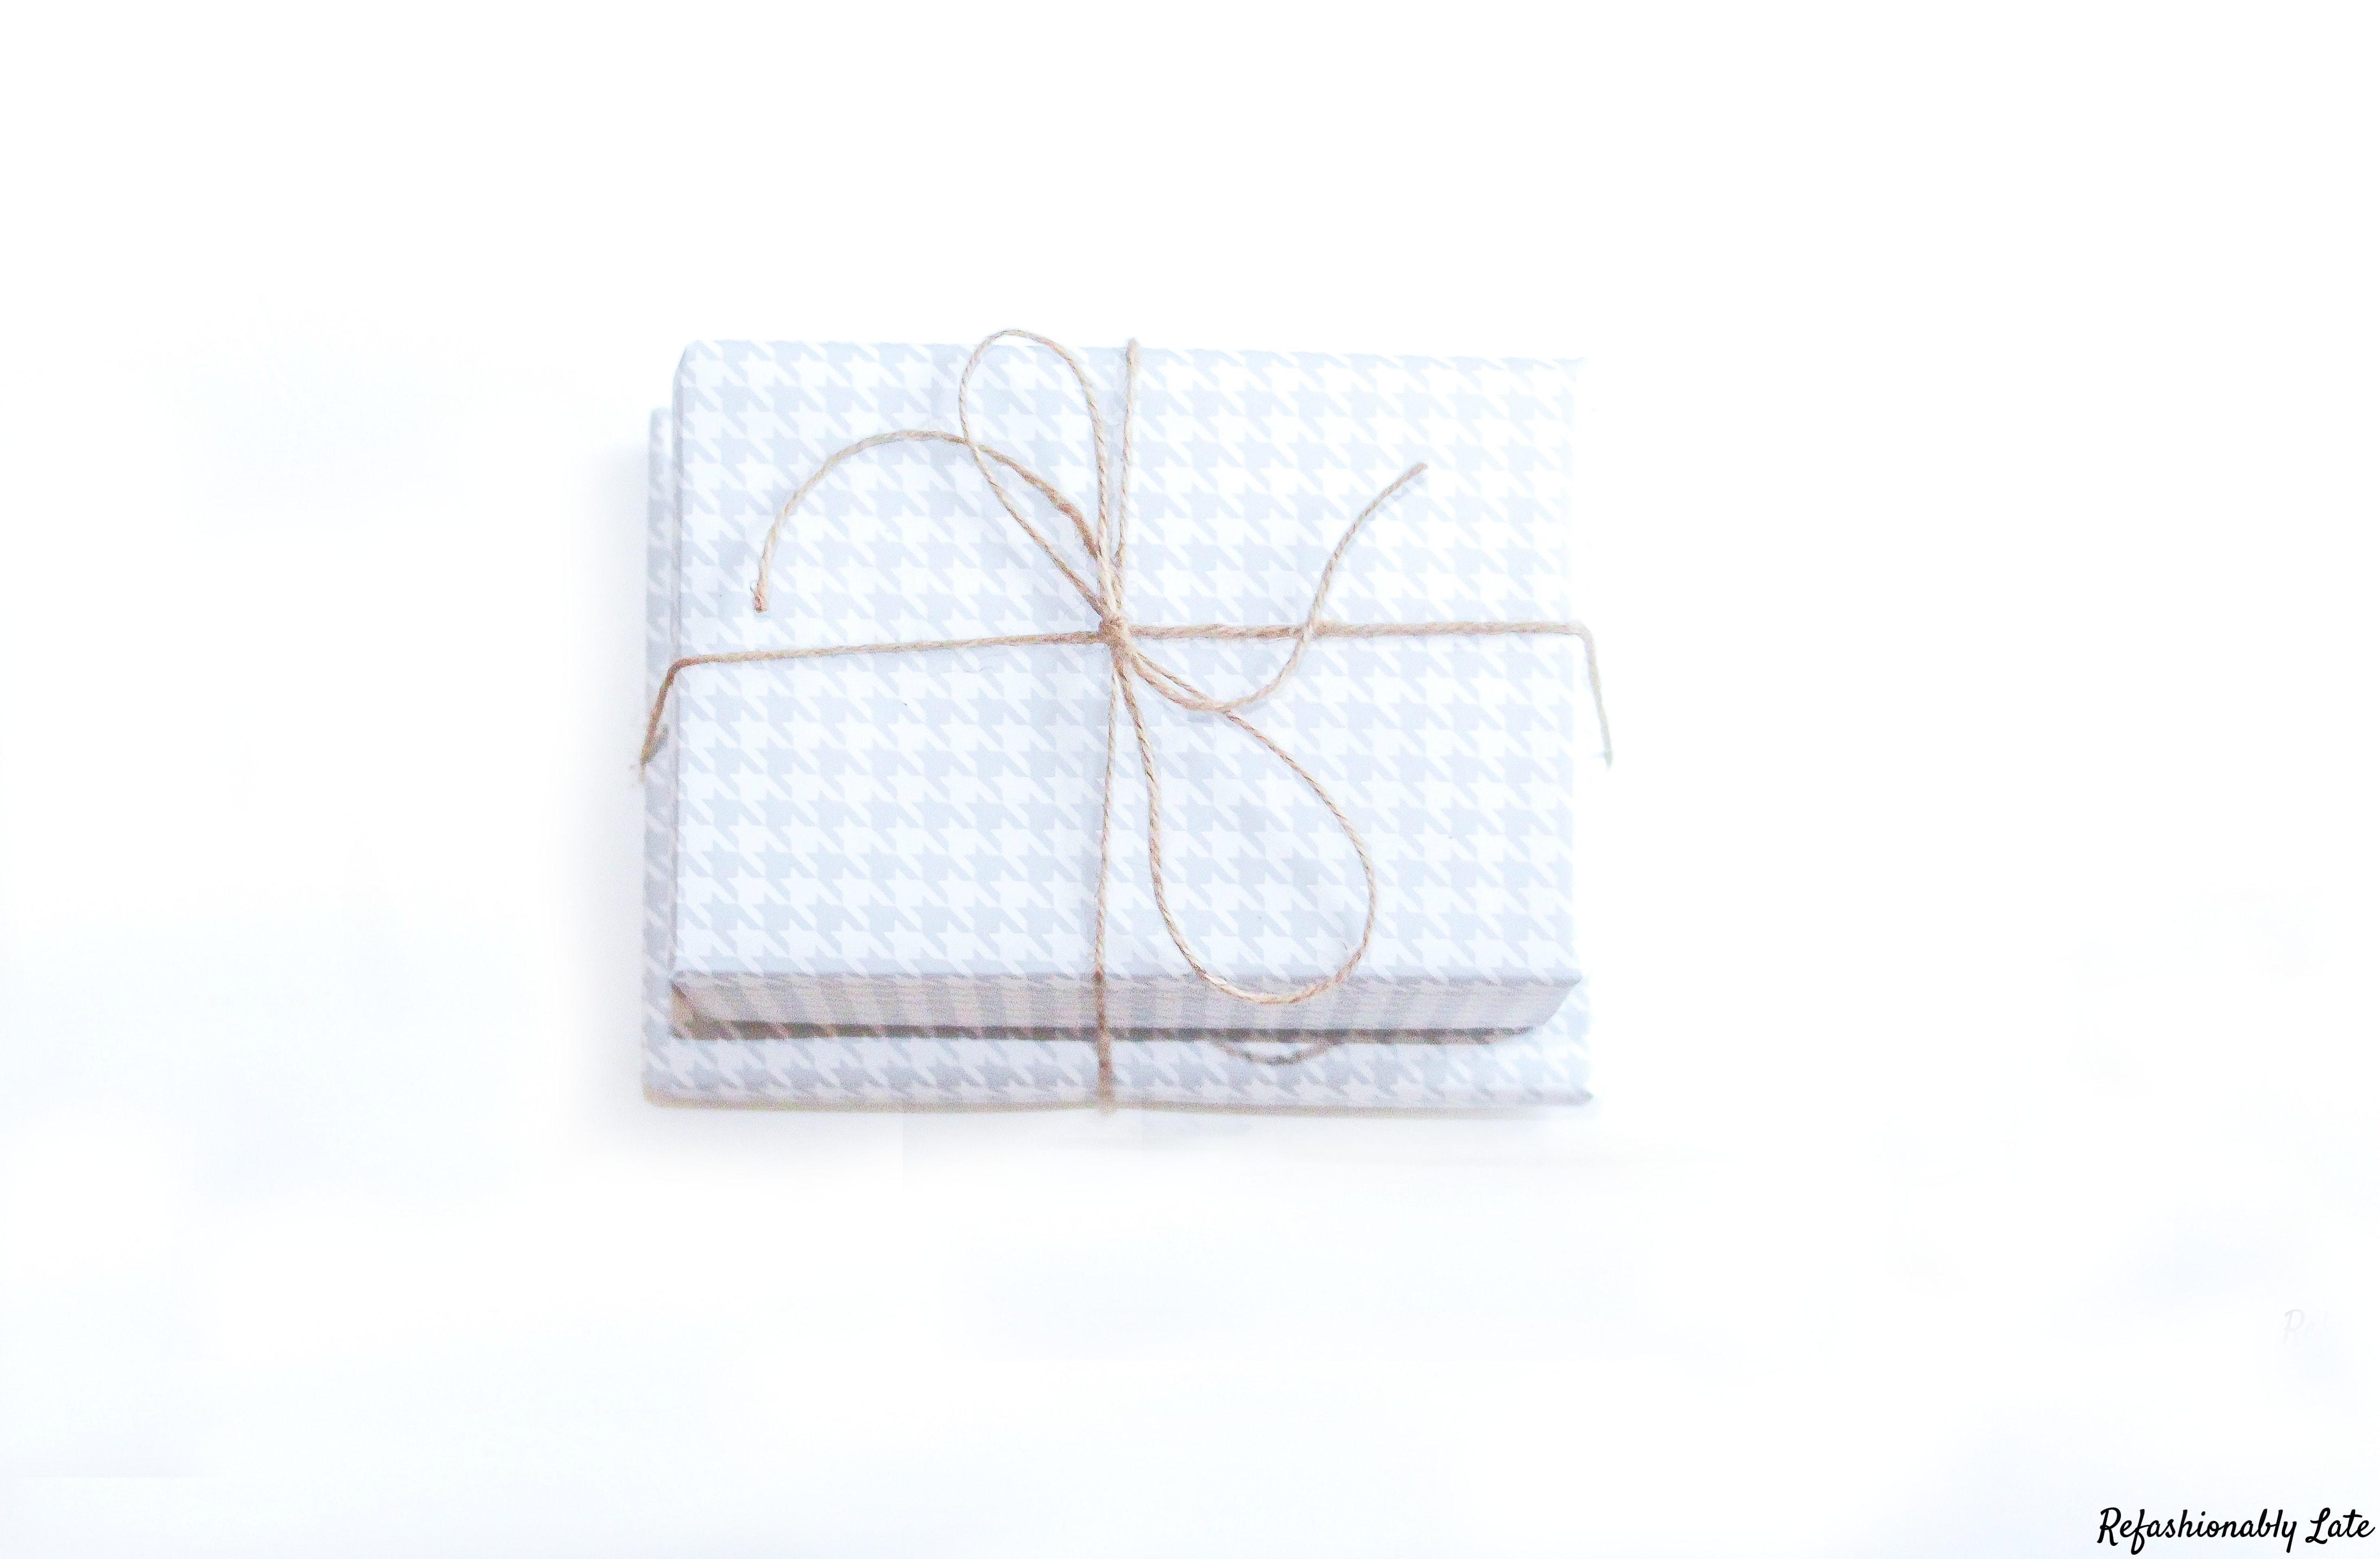 Preparing for Spring & Summer Gifts - www.refashionablylate.com